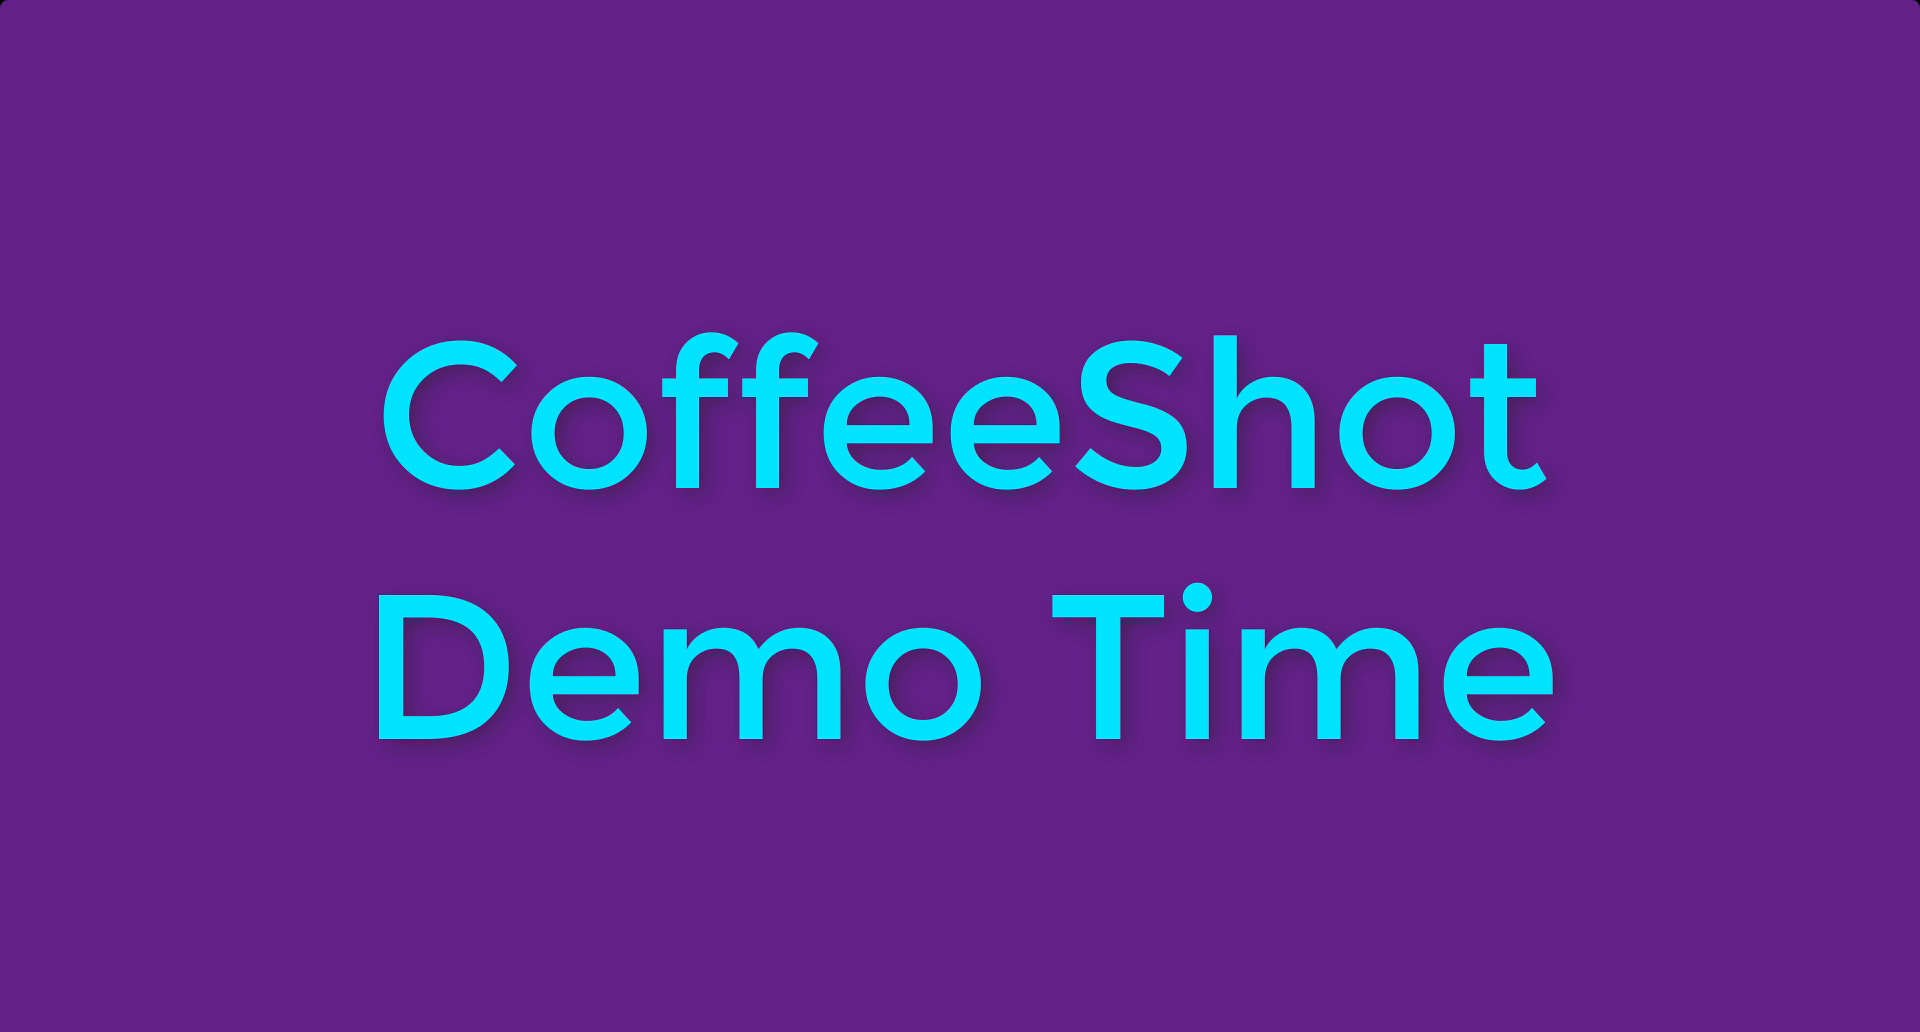 CoffeeShot Demo